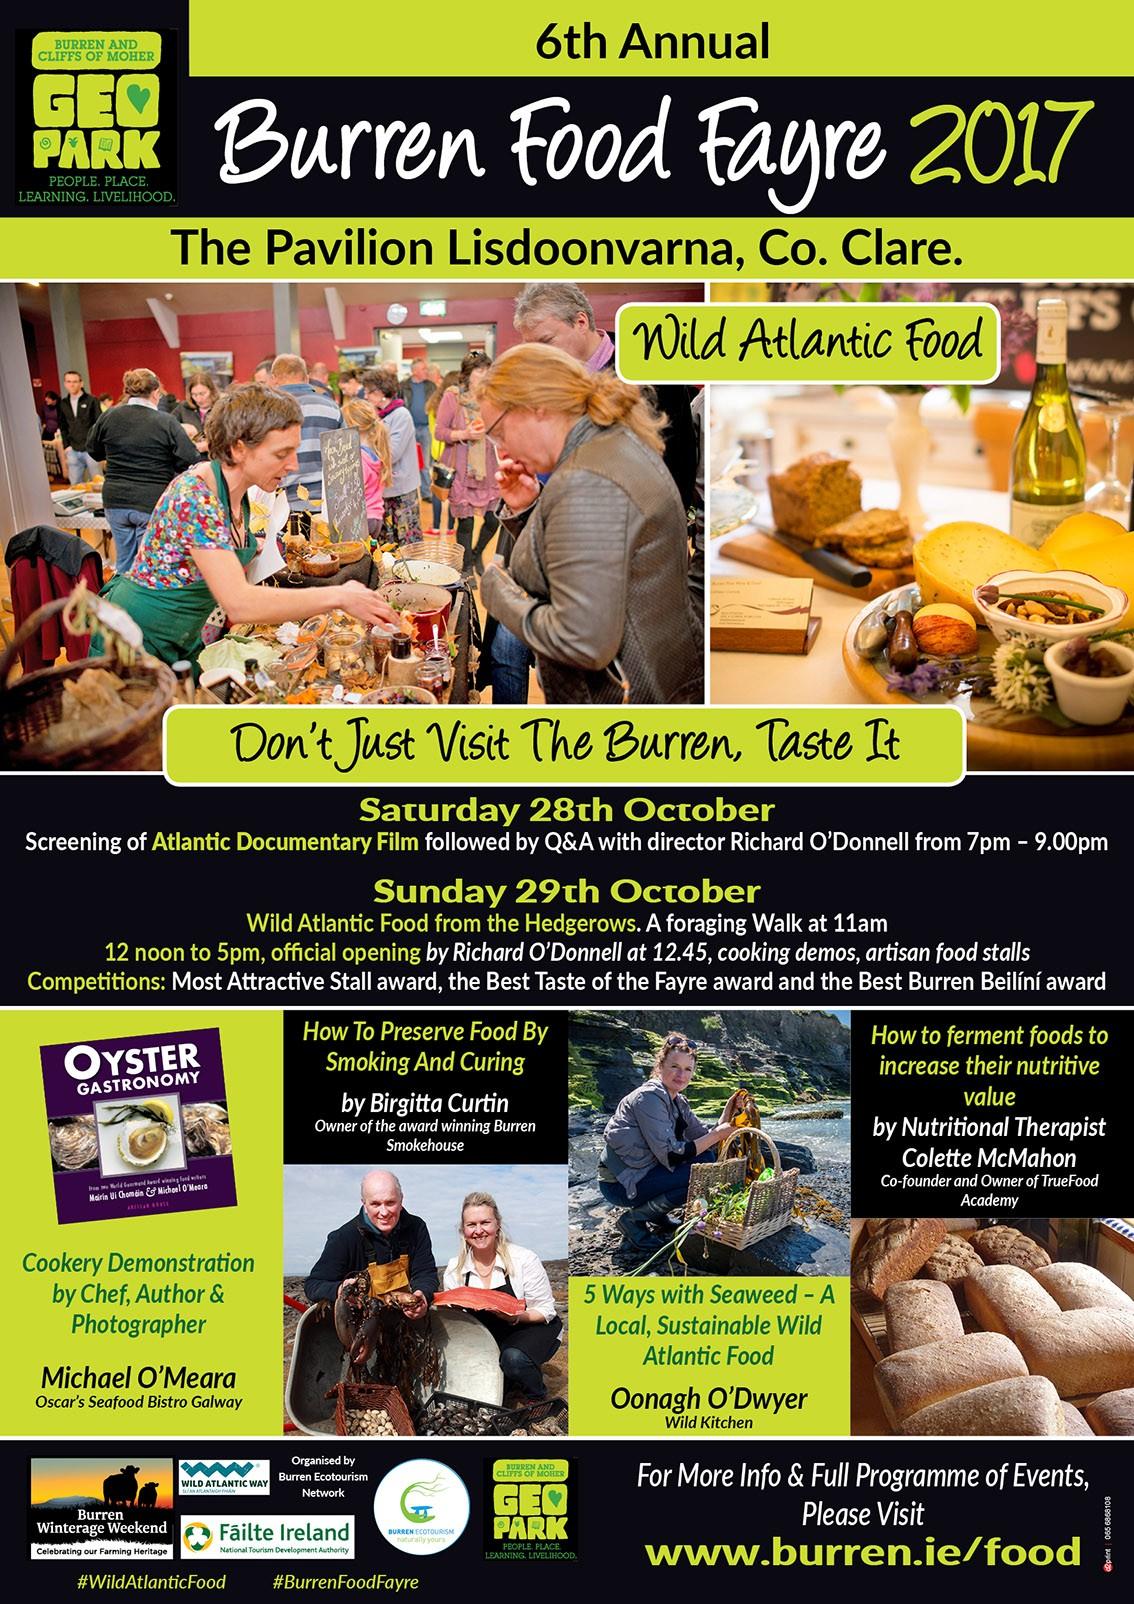 Burren food fayre, taste the Burren, eco-friendly